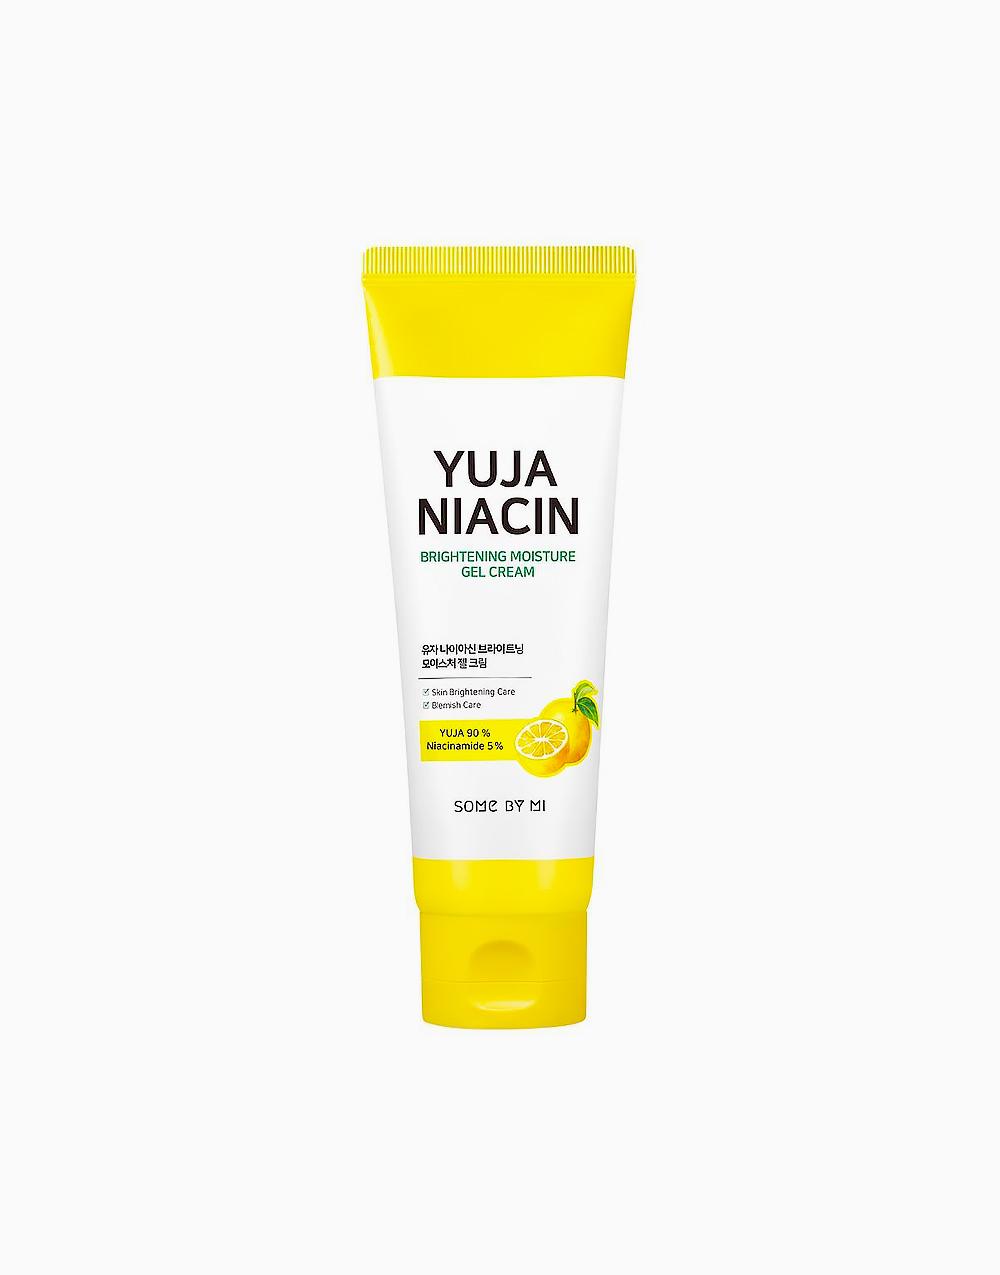 Yuja Niacin Brightening Moisture Gel Cream 100ml by Some By Mi